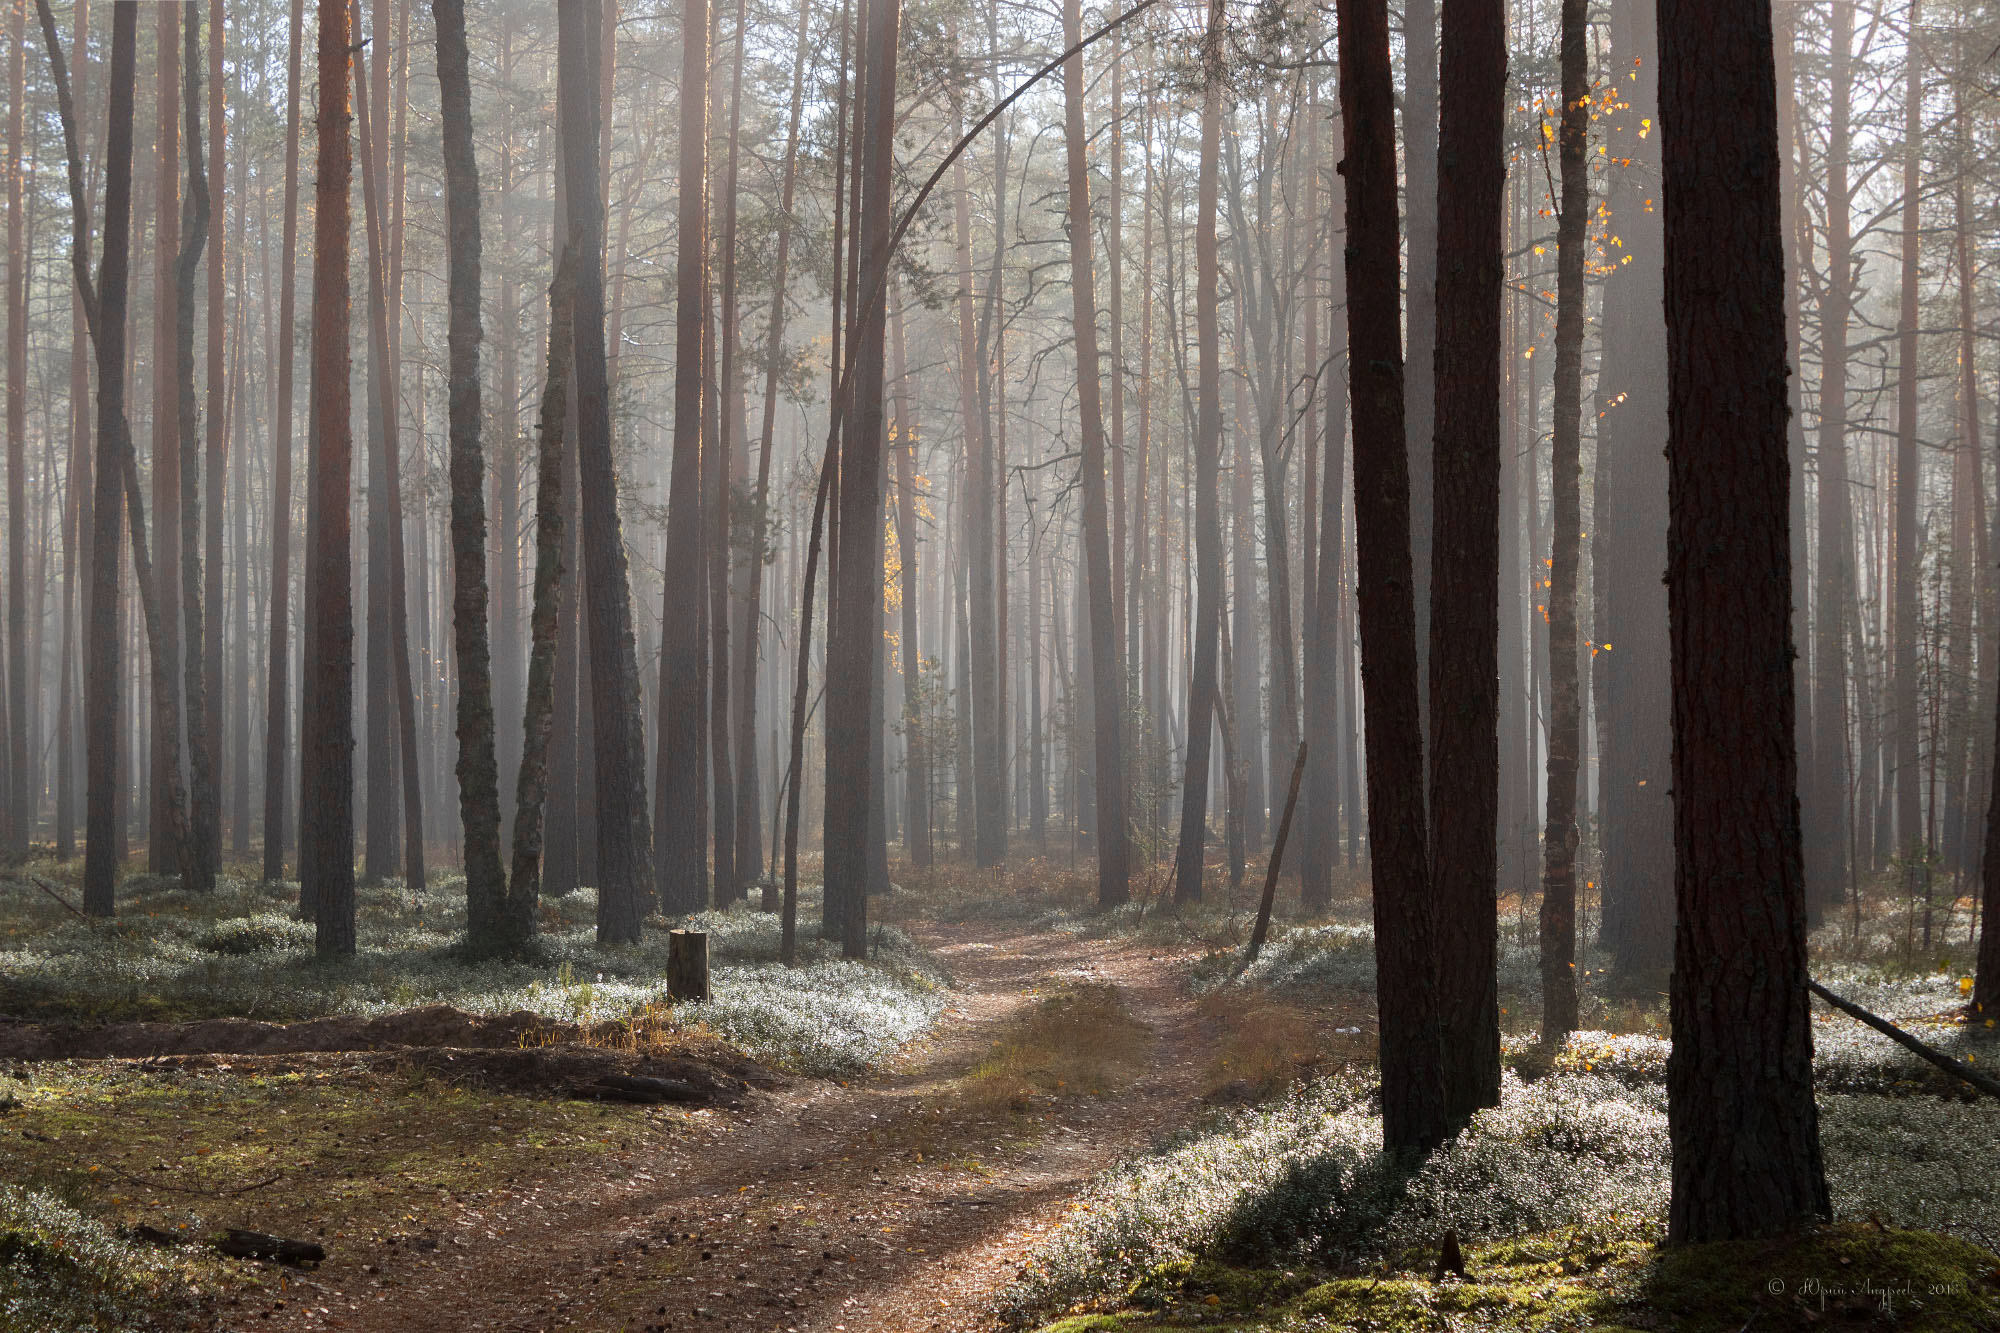 лес сосны бор туман, Юрий Андреев